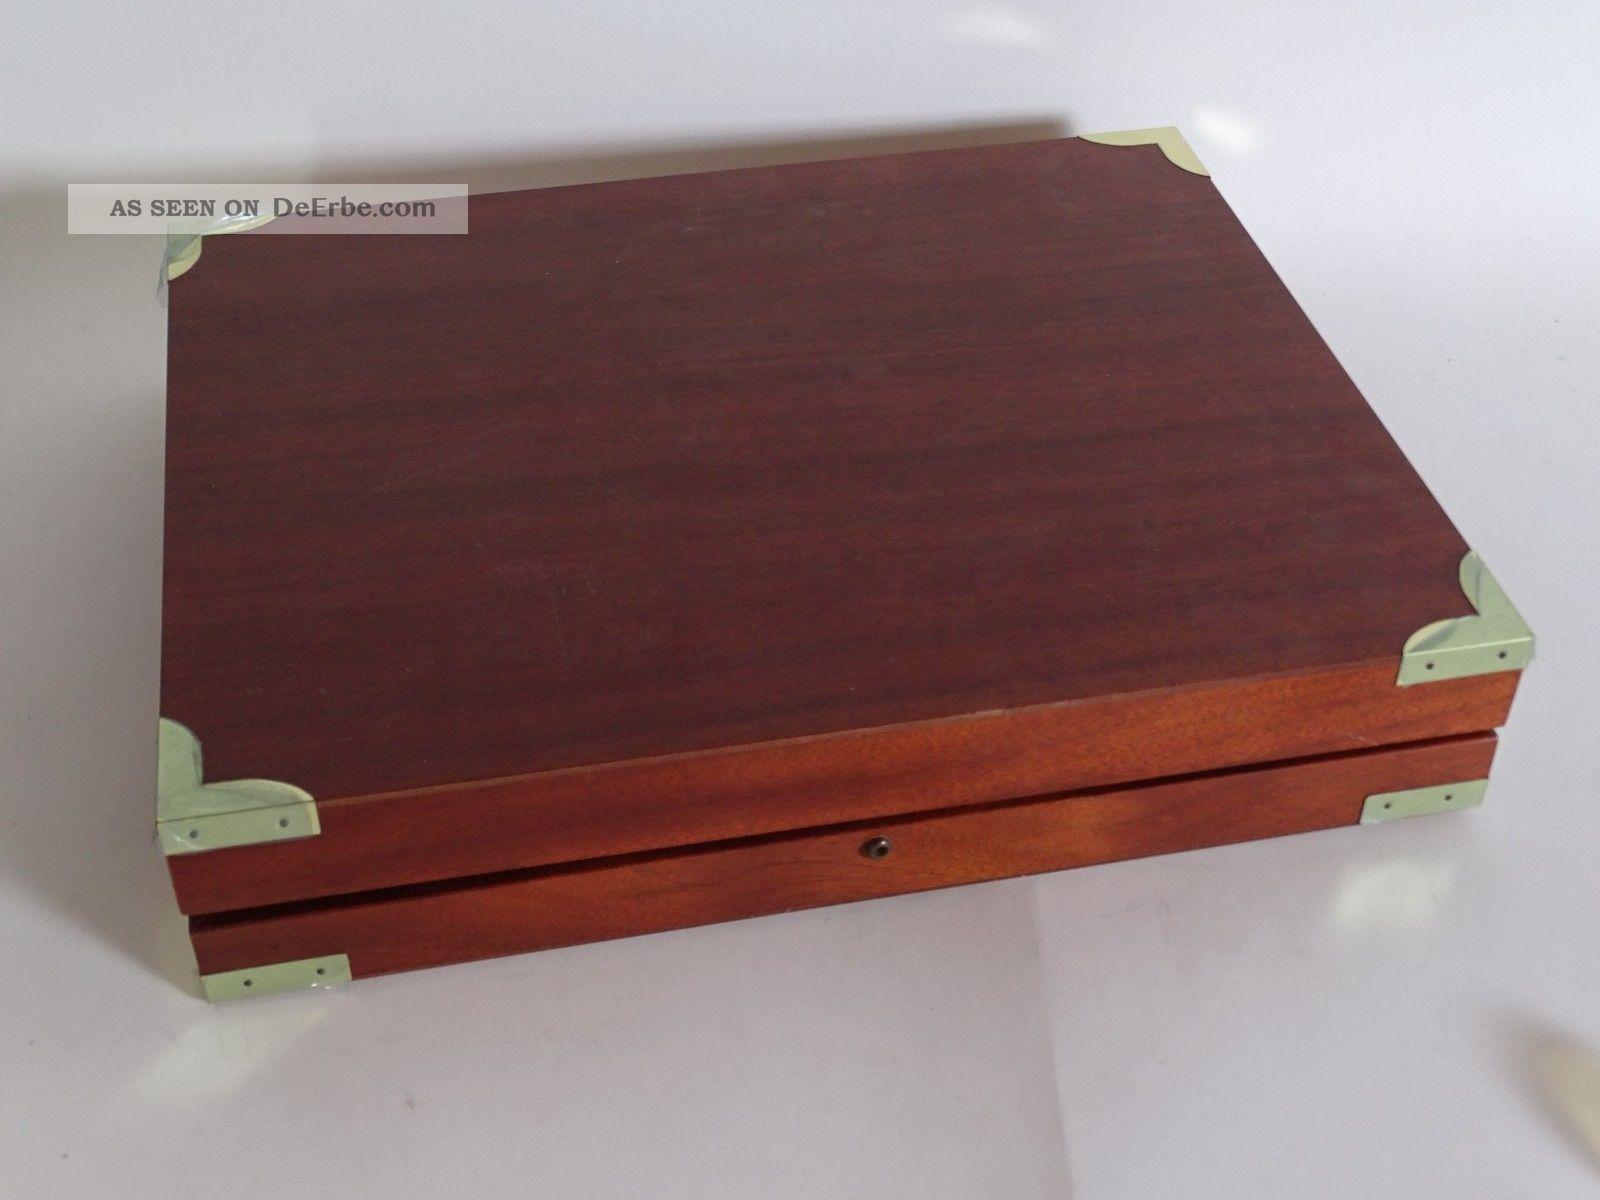 robbe berking besteck kasten aus hochwertigem holz. Black Bedroom Furniture Sets. Home Design Ideas